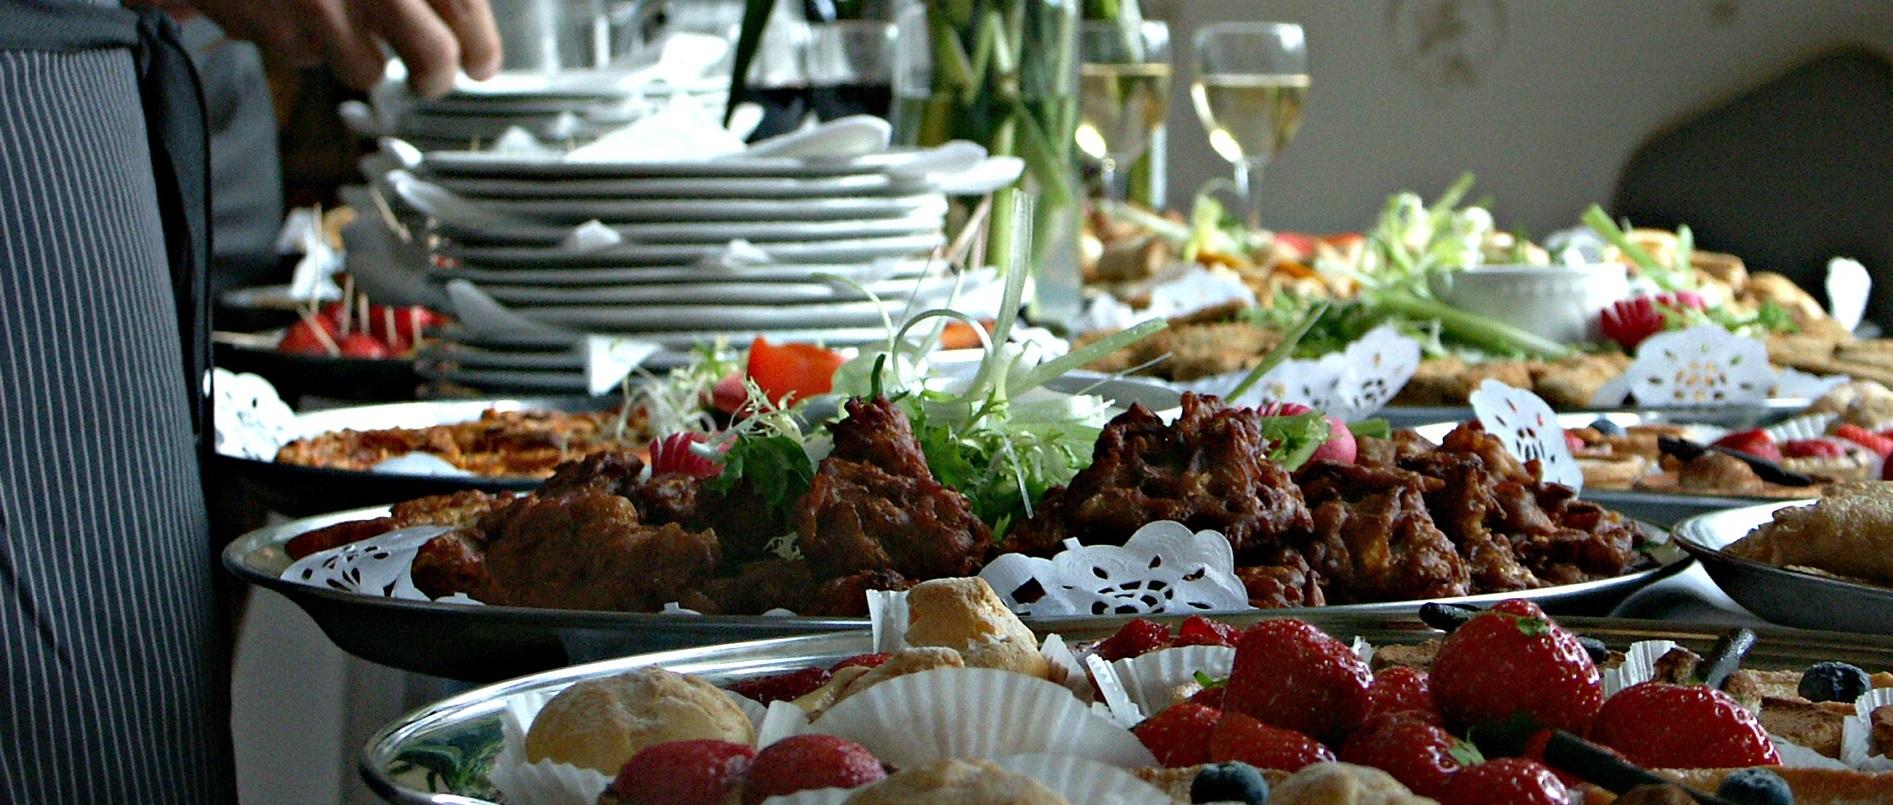 food-1682437_1920-wide